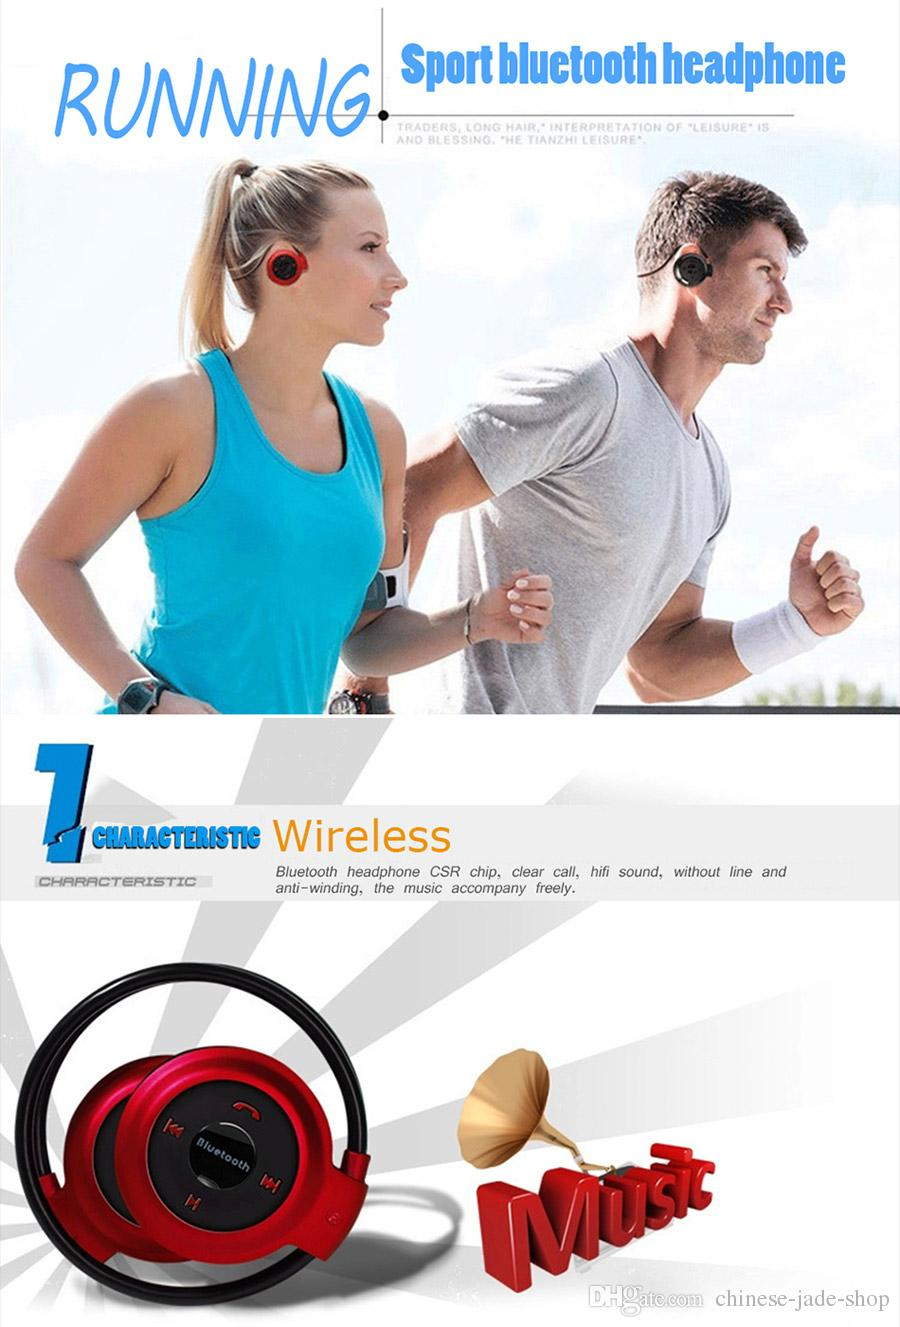 Mini 503 Bluetooth 4.0 Headset Sport Wireless Headphones Music Stereo Earphones FM Speakers Mini503 do not Support TF CARD